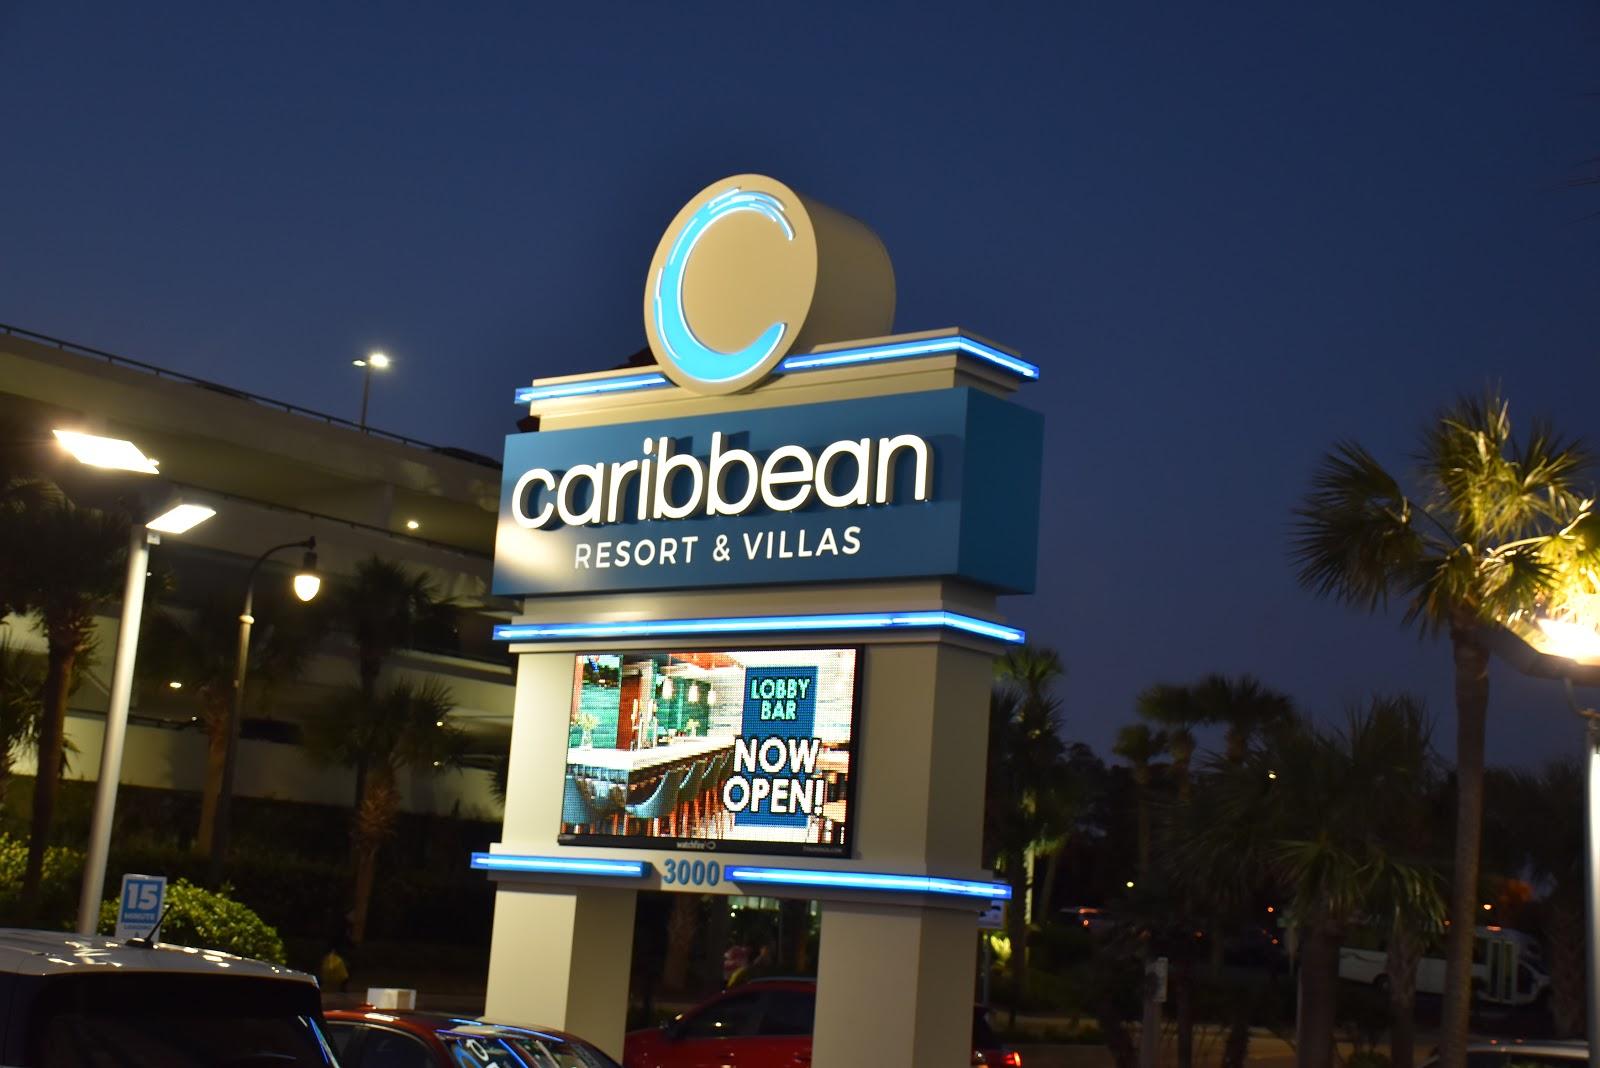 Caribbean Resort and Villas and Villas in Myrtle Beach